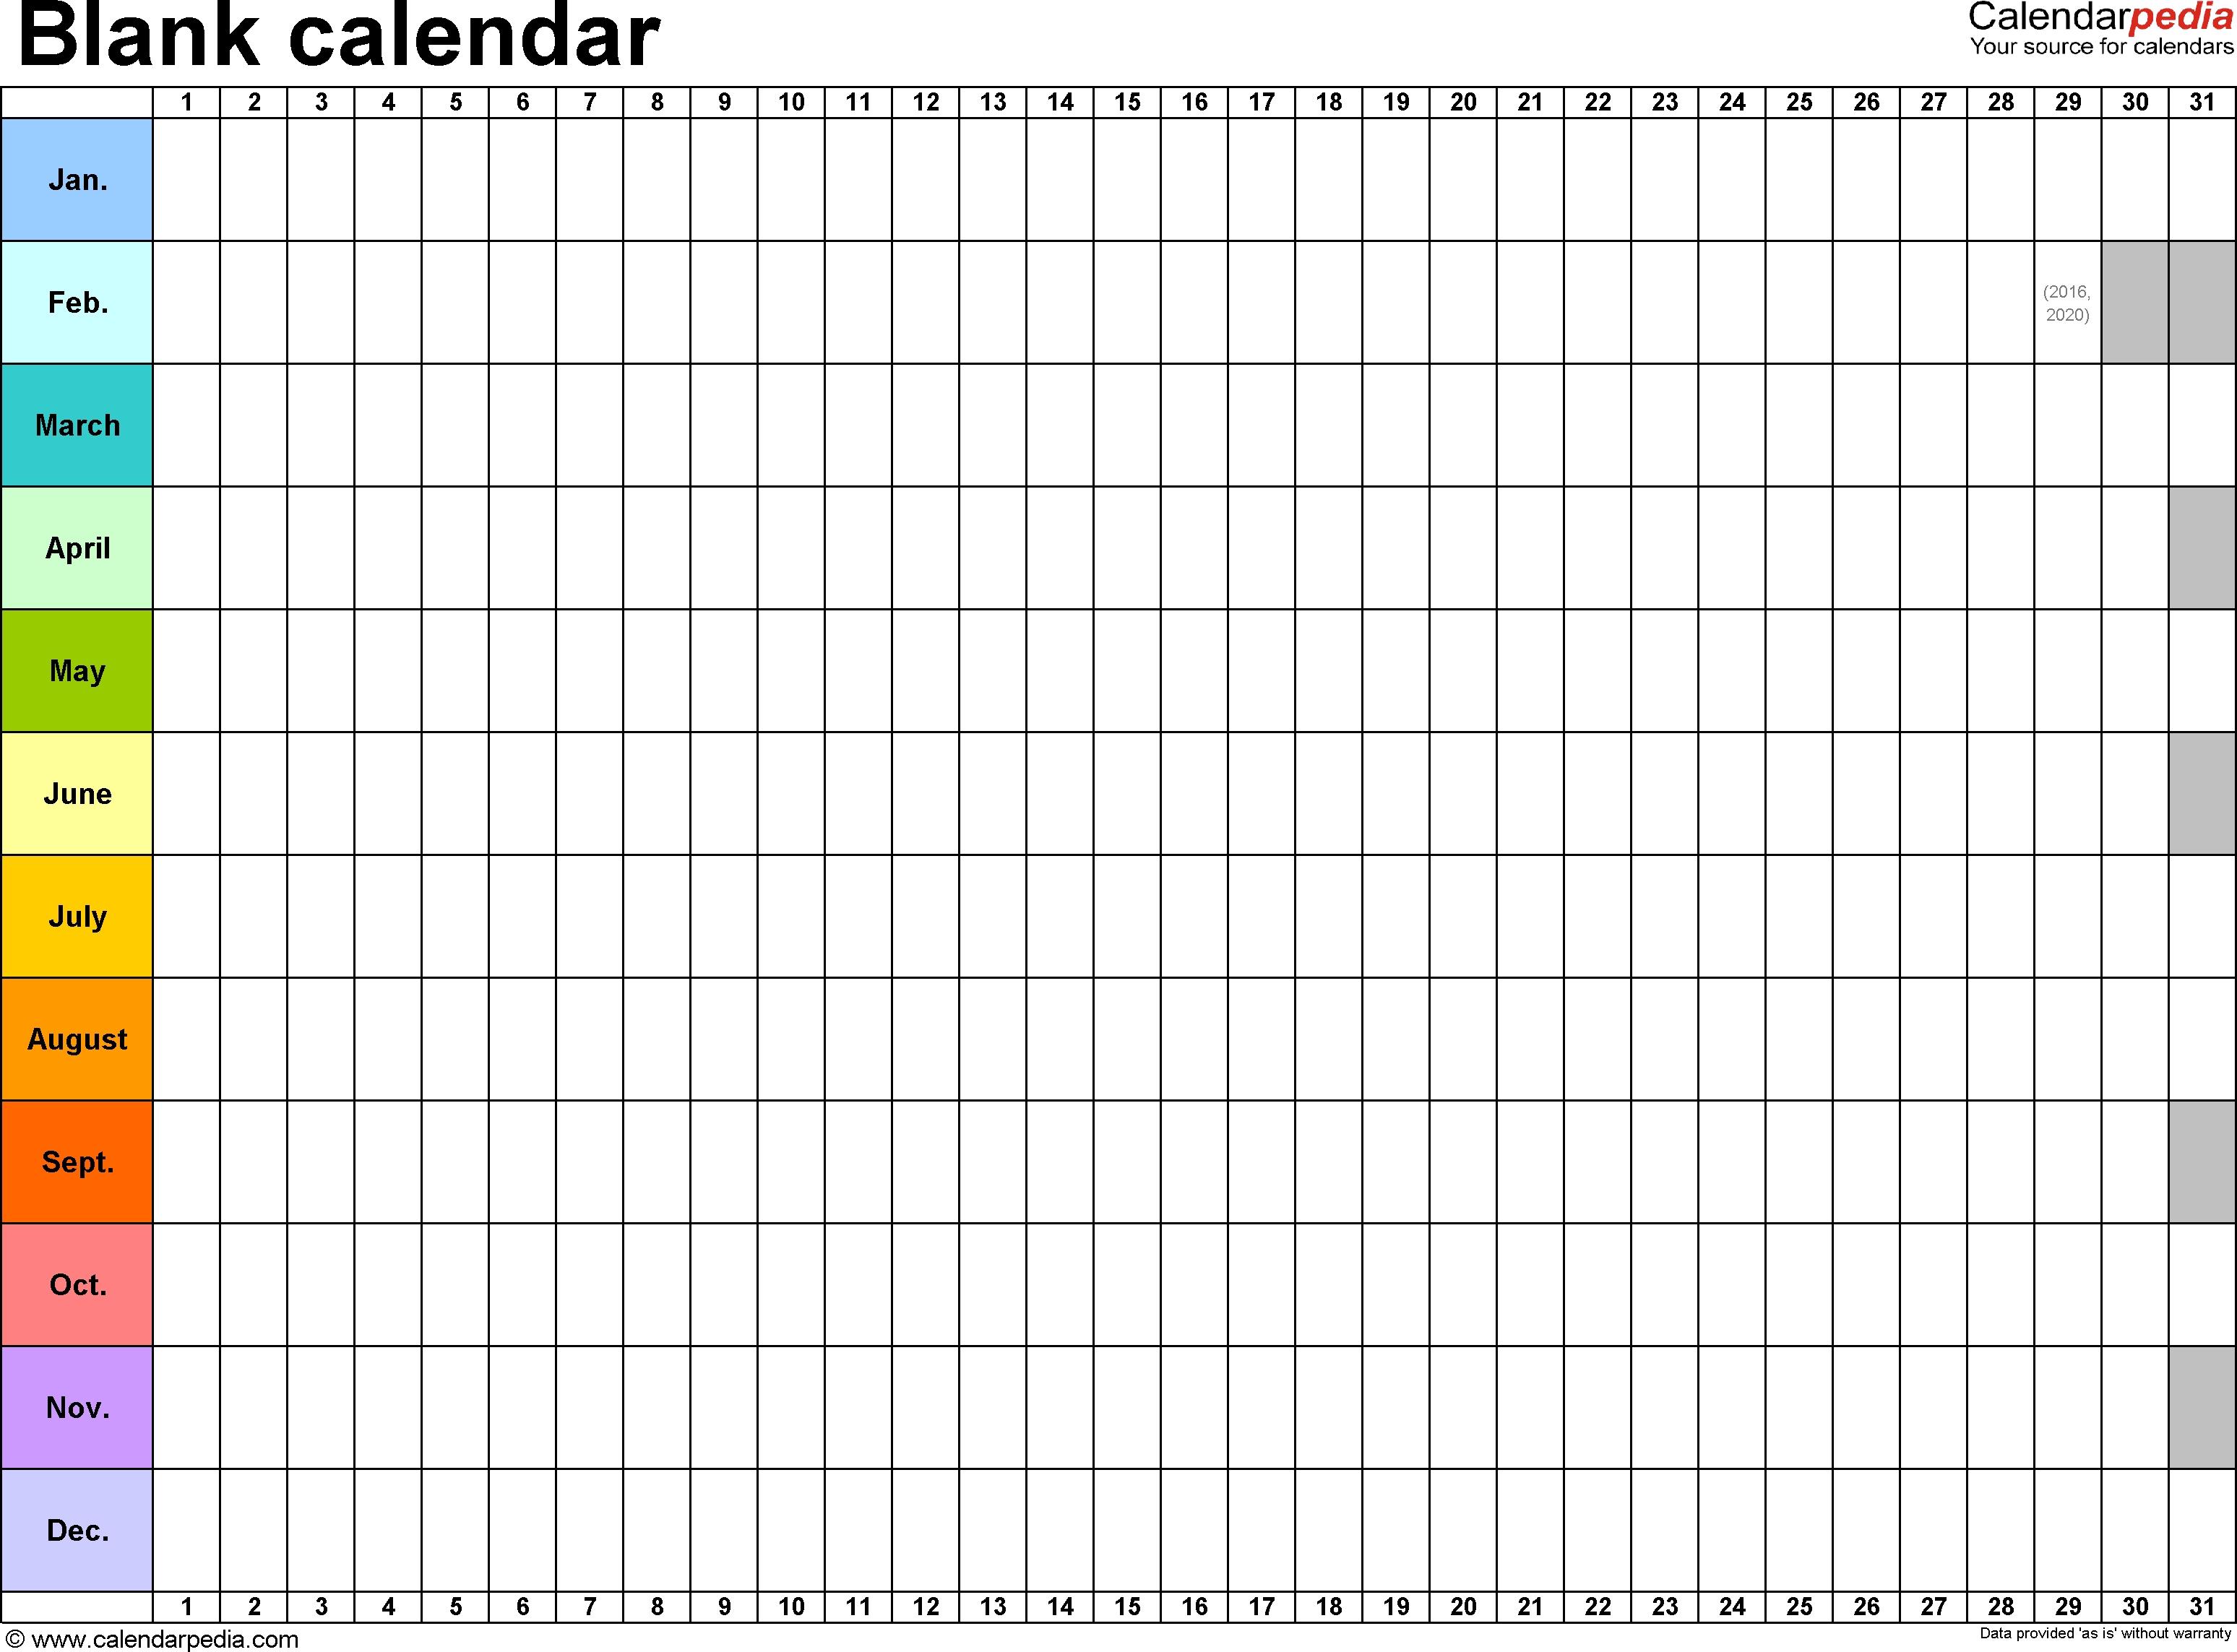 Blank Calendar - 9 Free Printable Microsoft Word Templates-Printable Blank Calendar Sheets